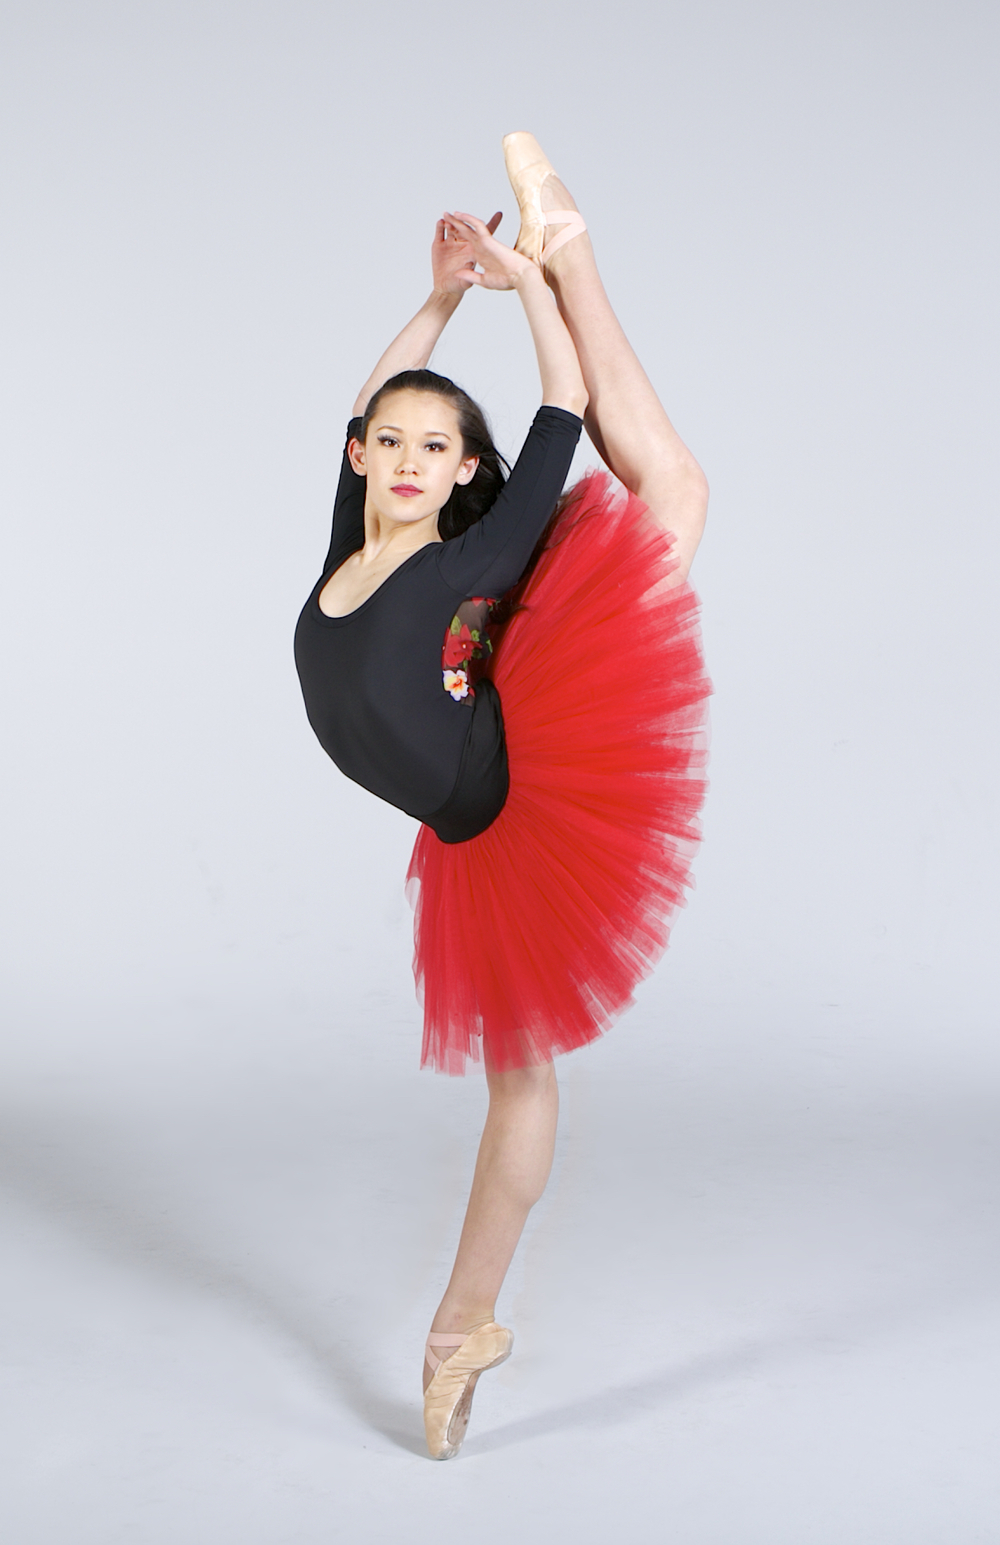 Ballet Intensive Information